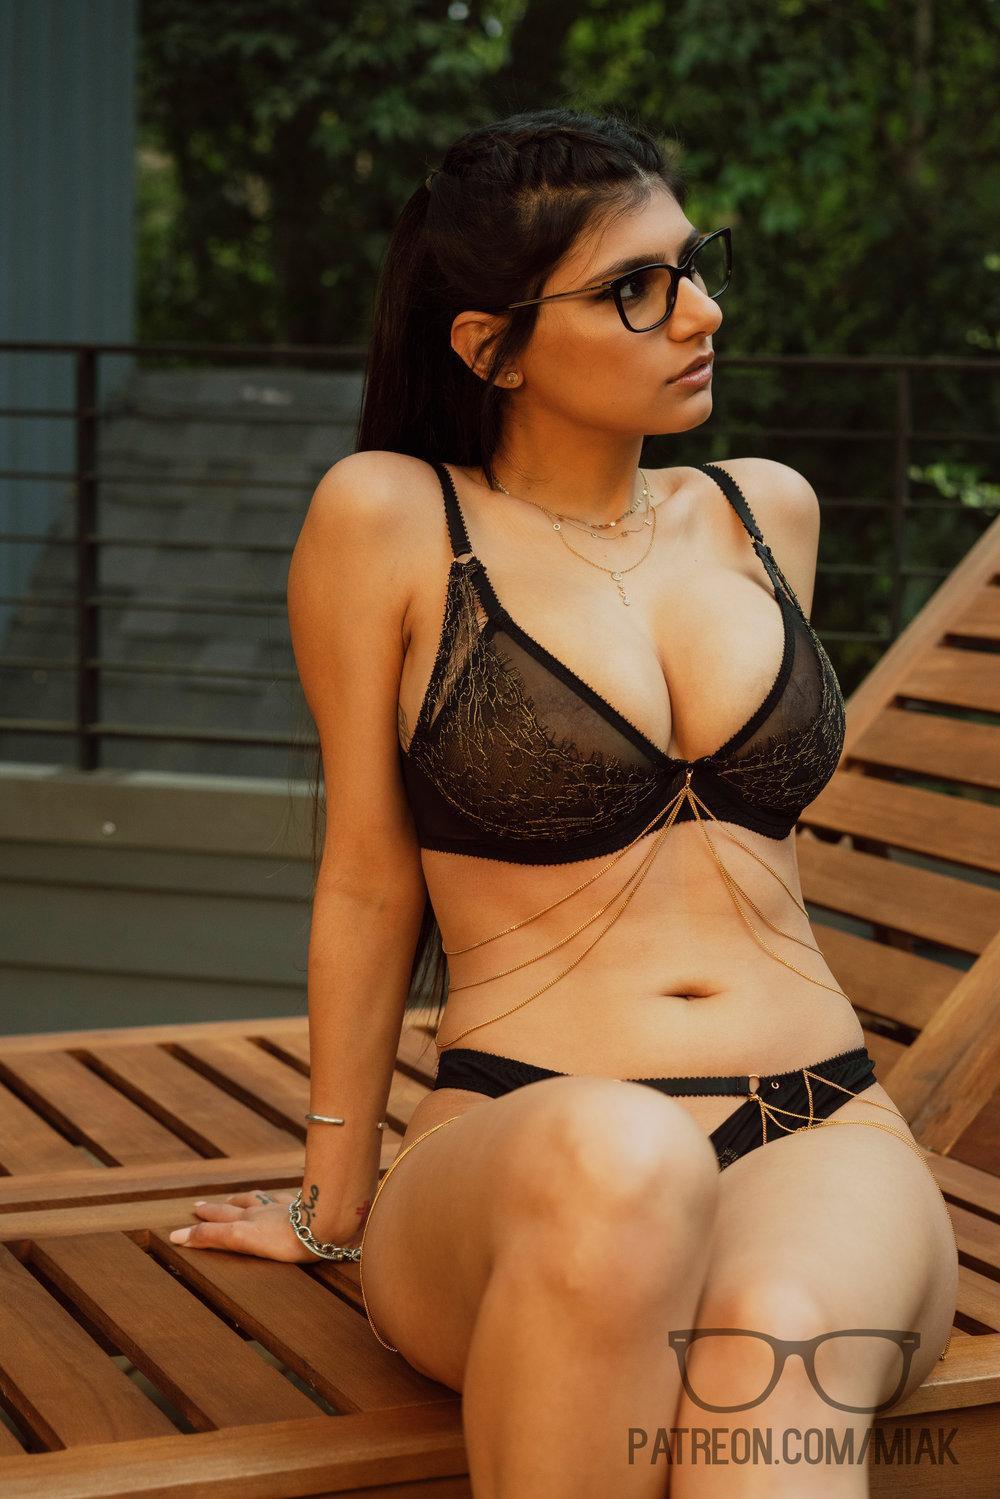 Mia Khalifa Outdoor Lingerie Patreon Set Leaked Zthsql